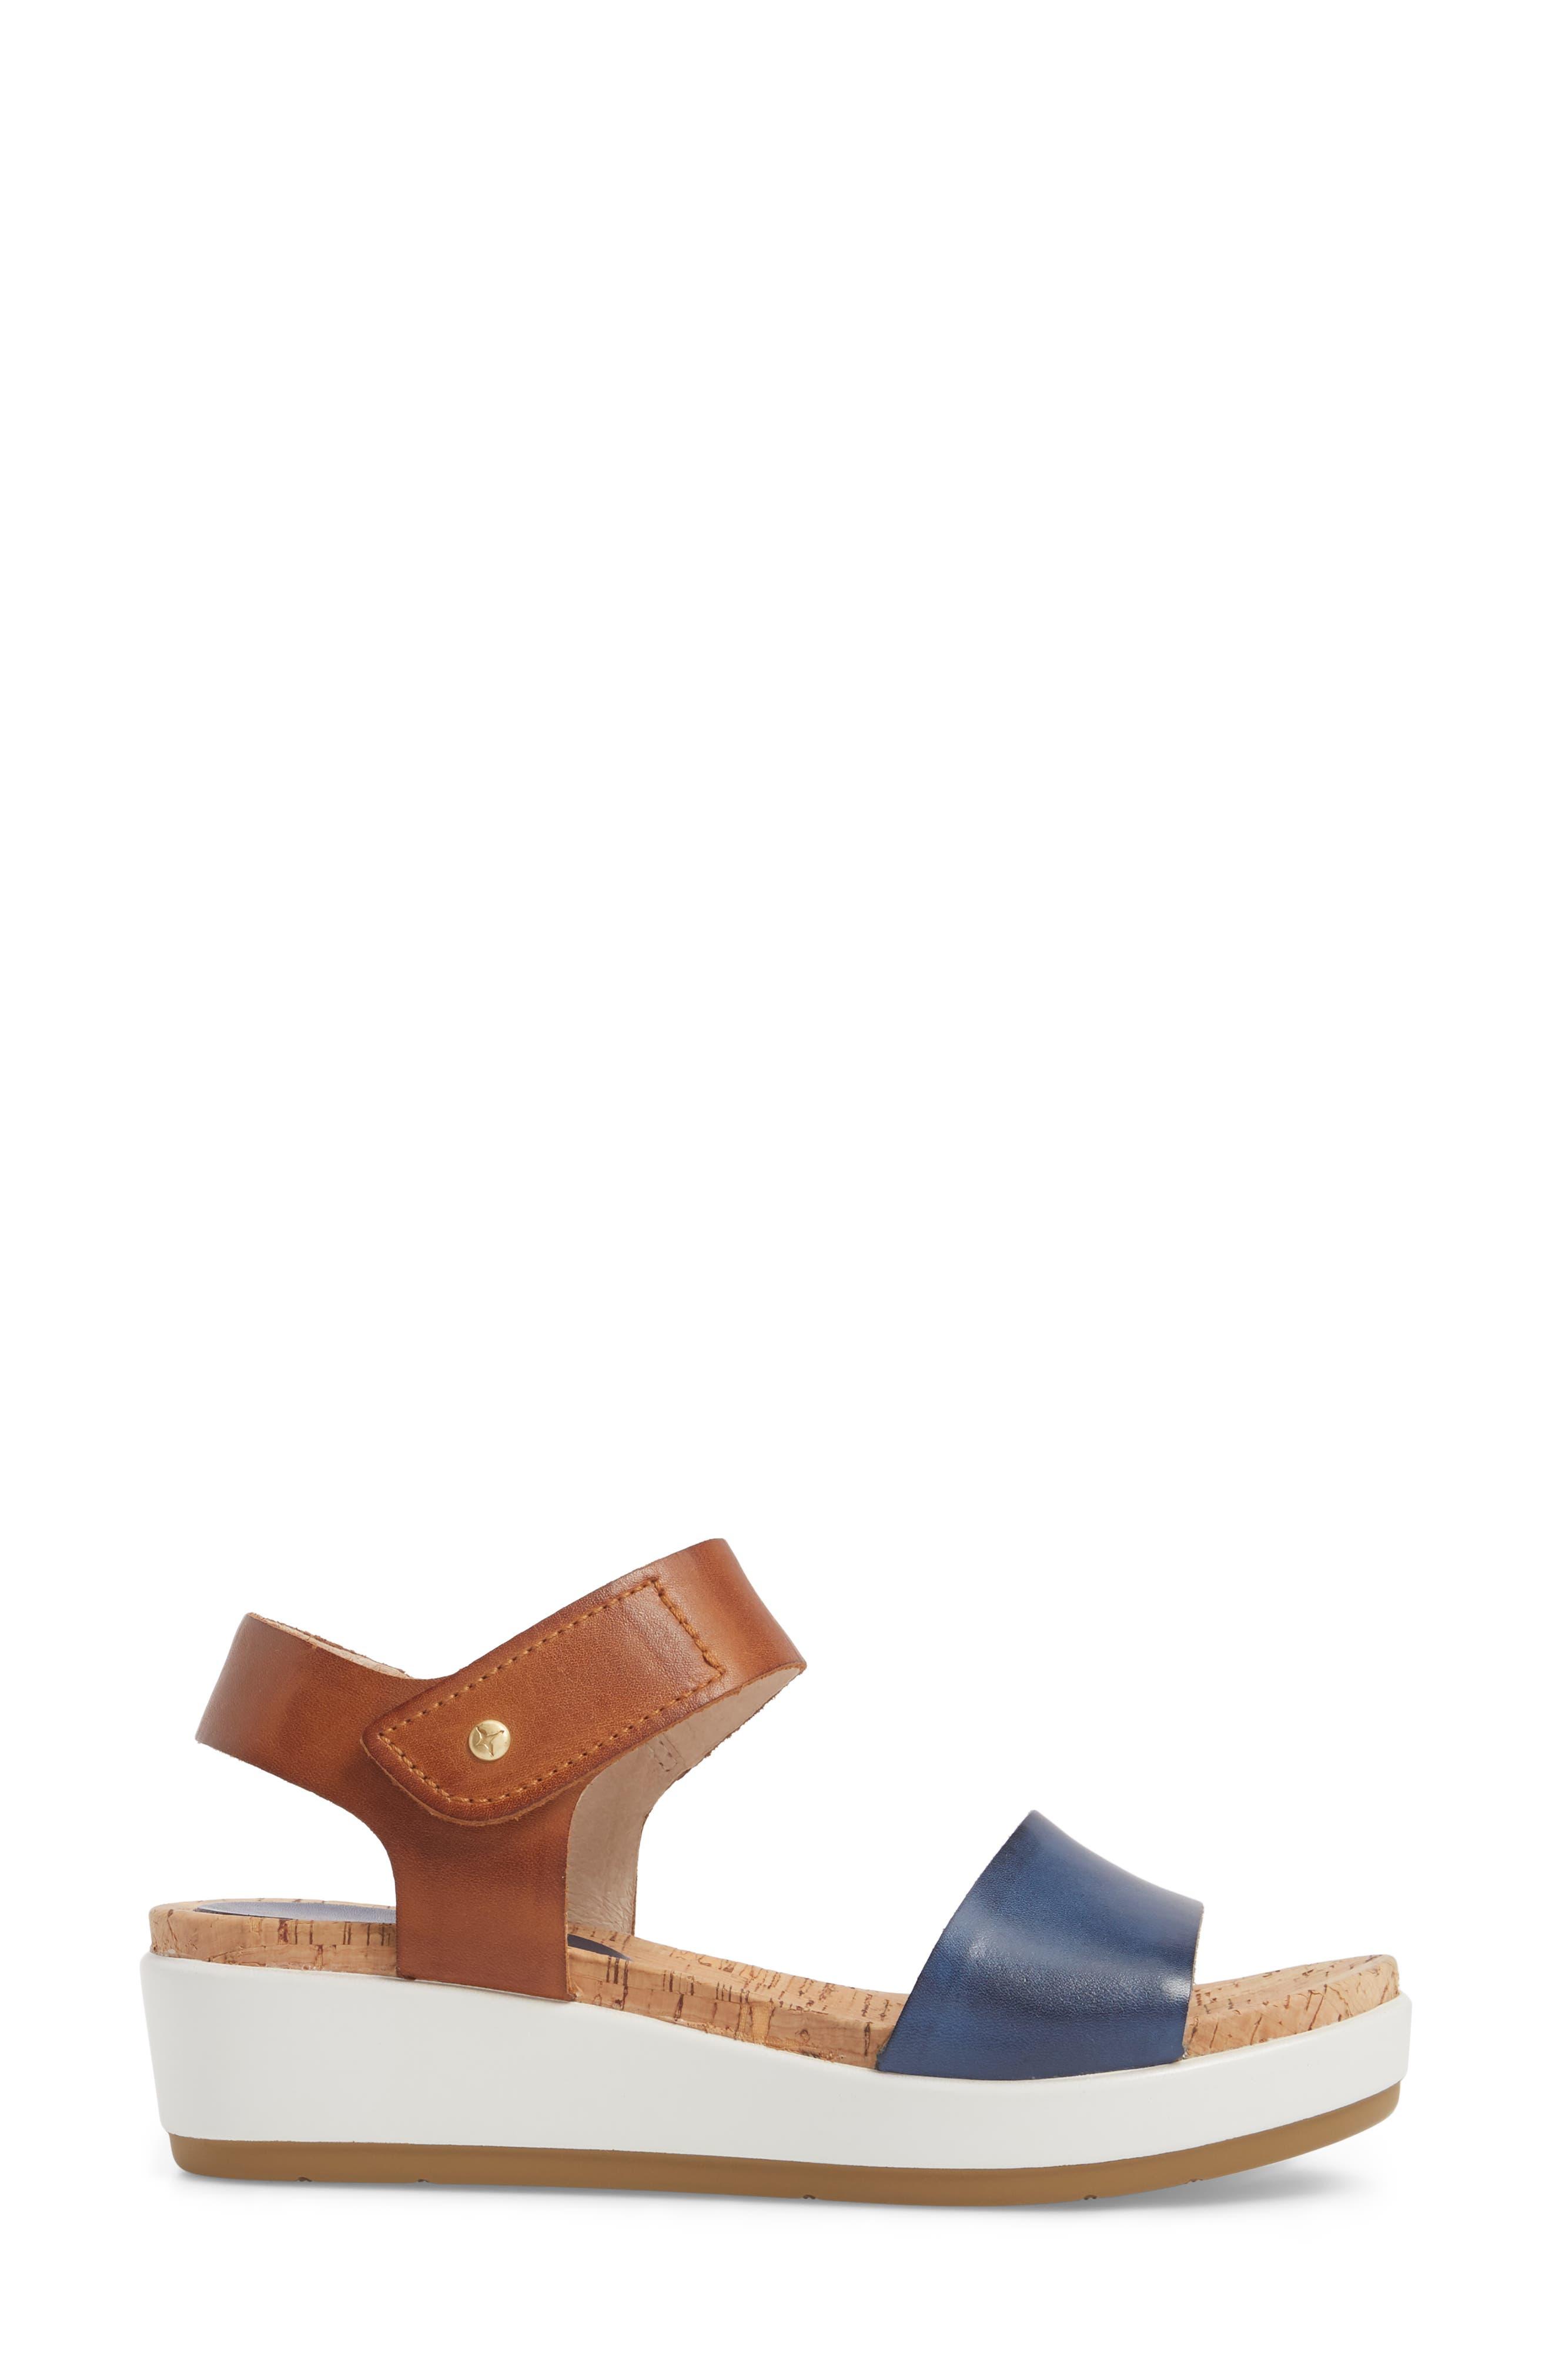 Mykonos Sport Sandal,                             Alternate thumbnail 3, color,                             Royal Blue Leather